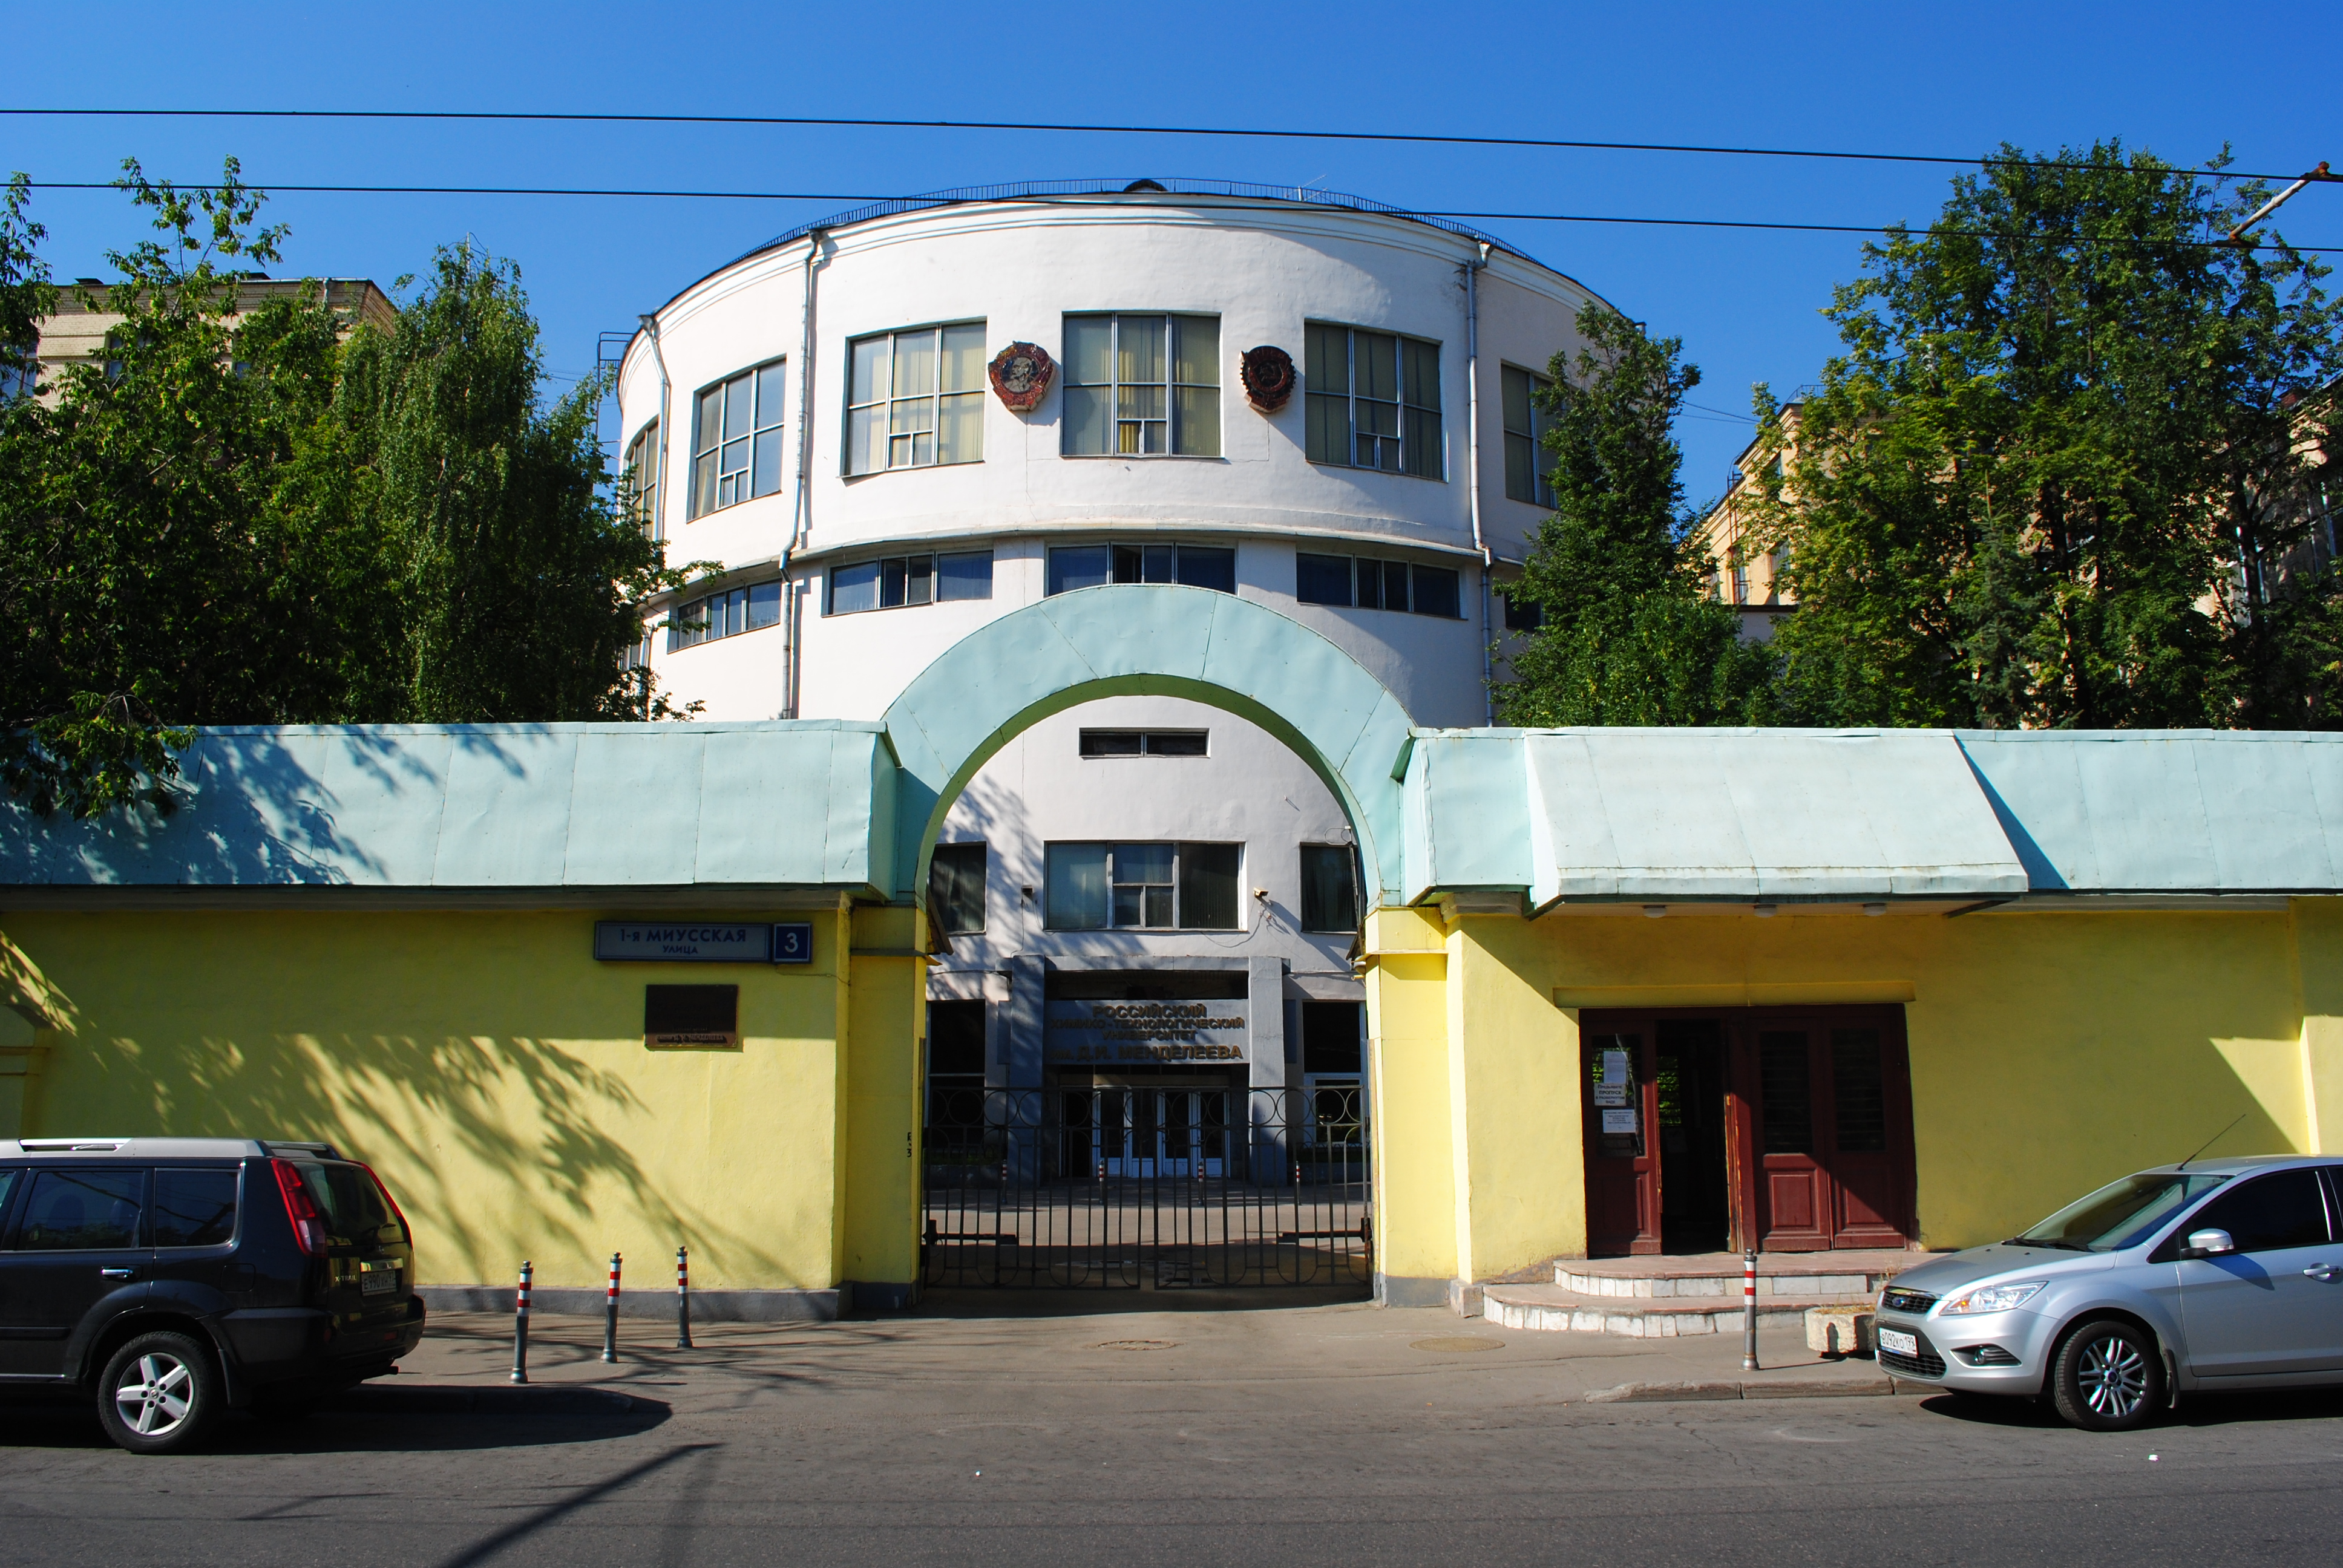 Получения ТУ до сдачи объекта в Менделеево получения ТУ до сдачи объекта в Гвоздева улица